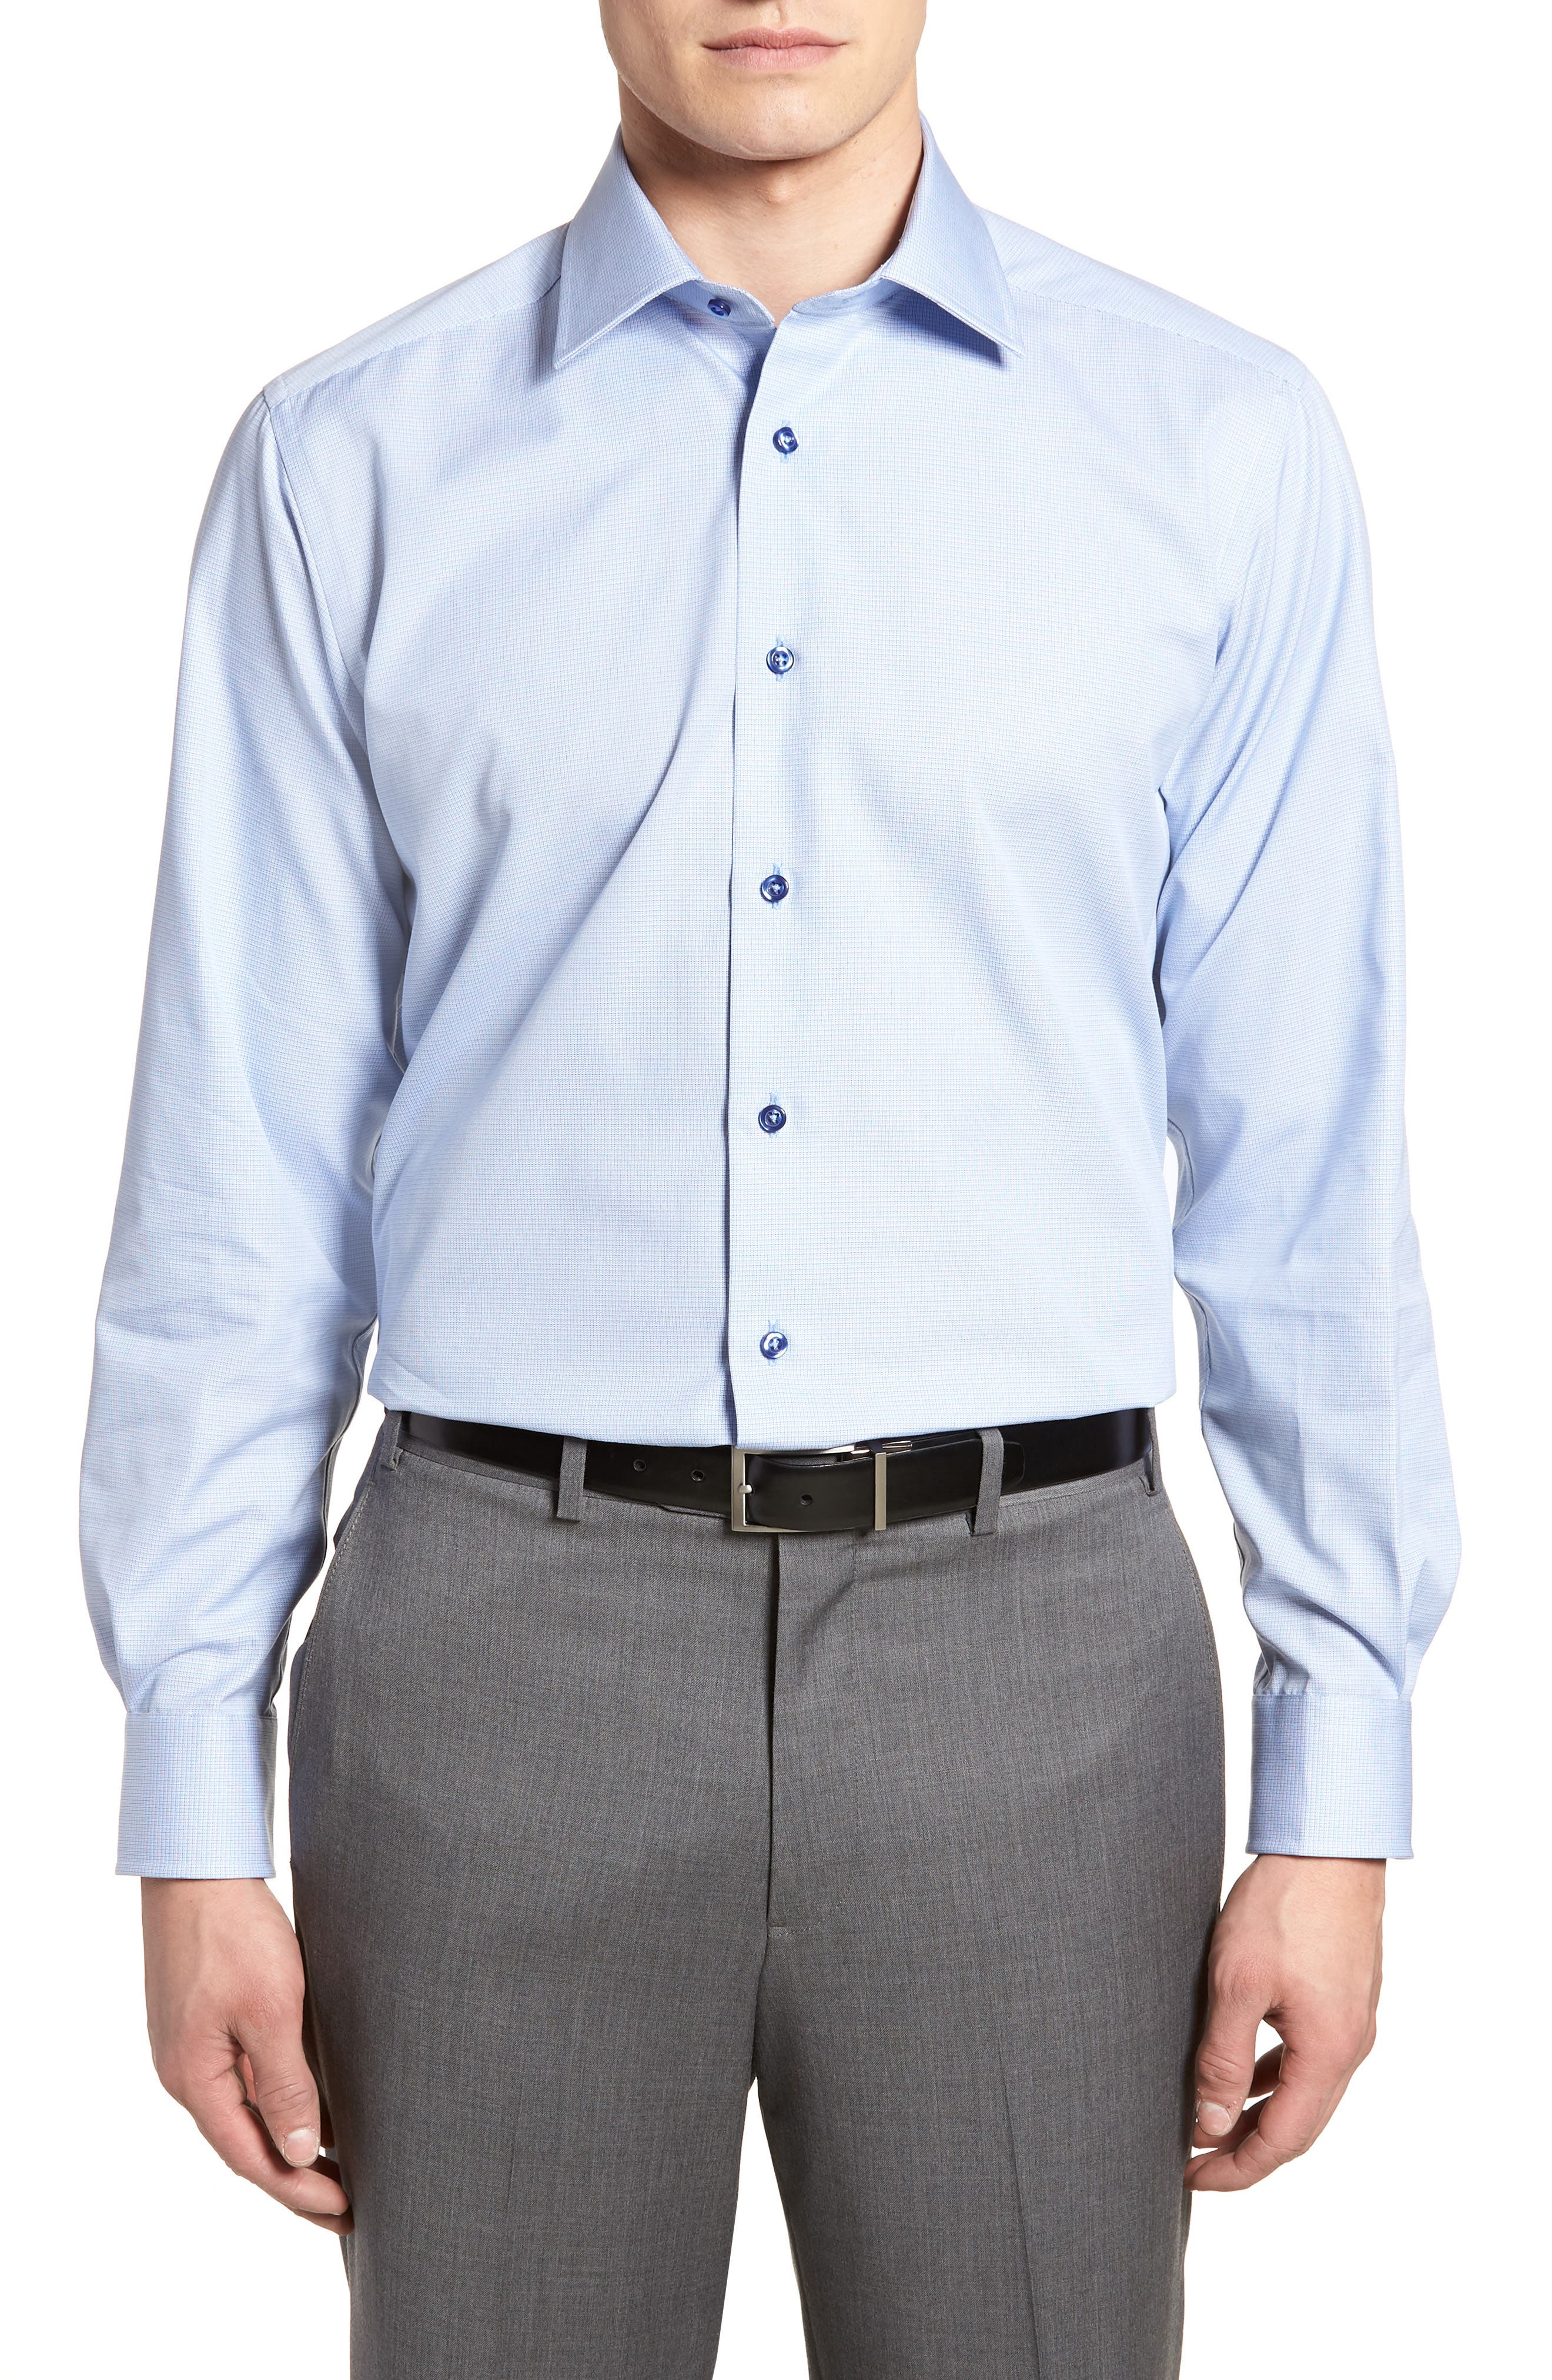 Regular Fit Solid Dress Shirt,                             Main thumbnail 1, color,                             423